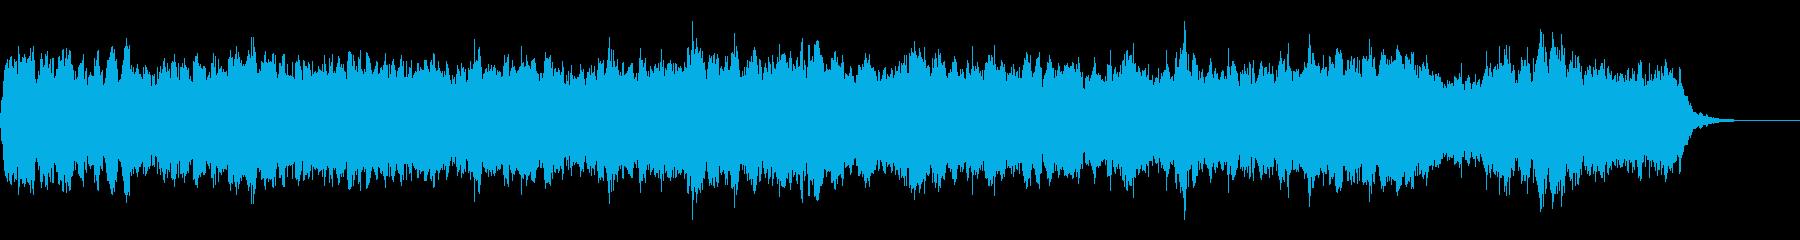 Bach Minuet オーケストラ風の再生済みの波形